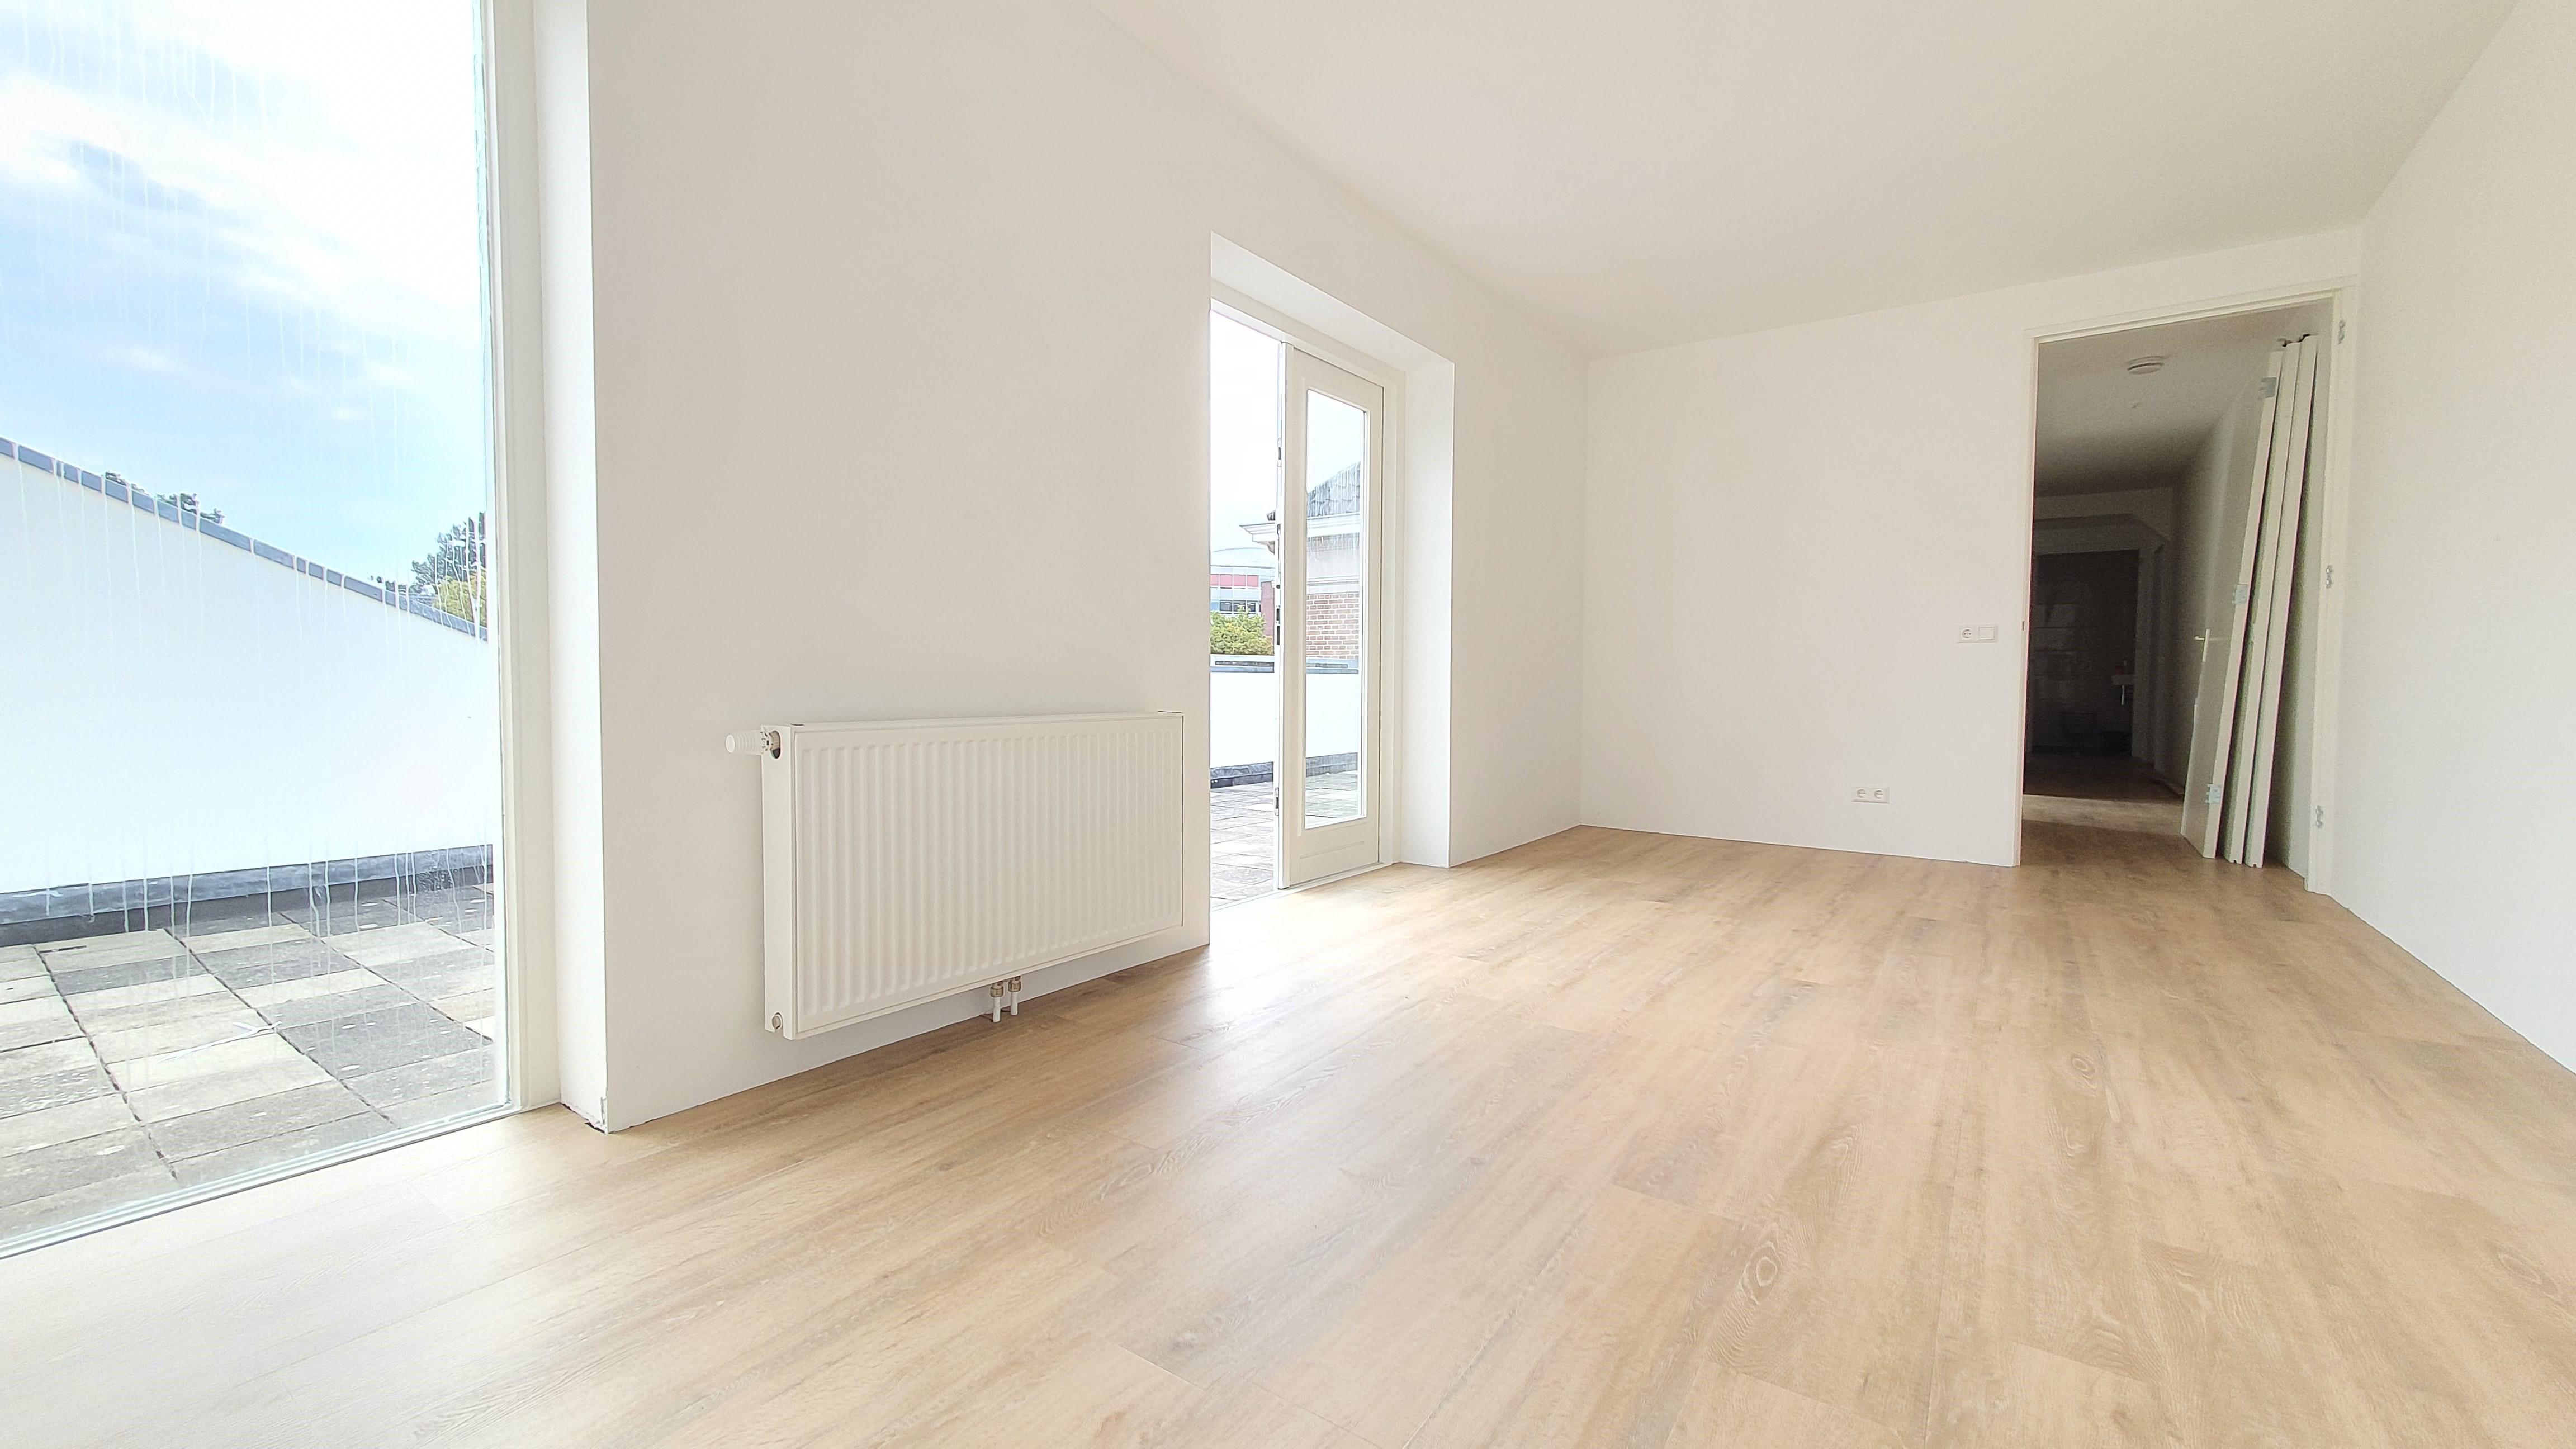 Te huur: Appartement Achter de Arnhemse Poortwal, Amersfoort - 5